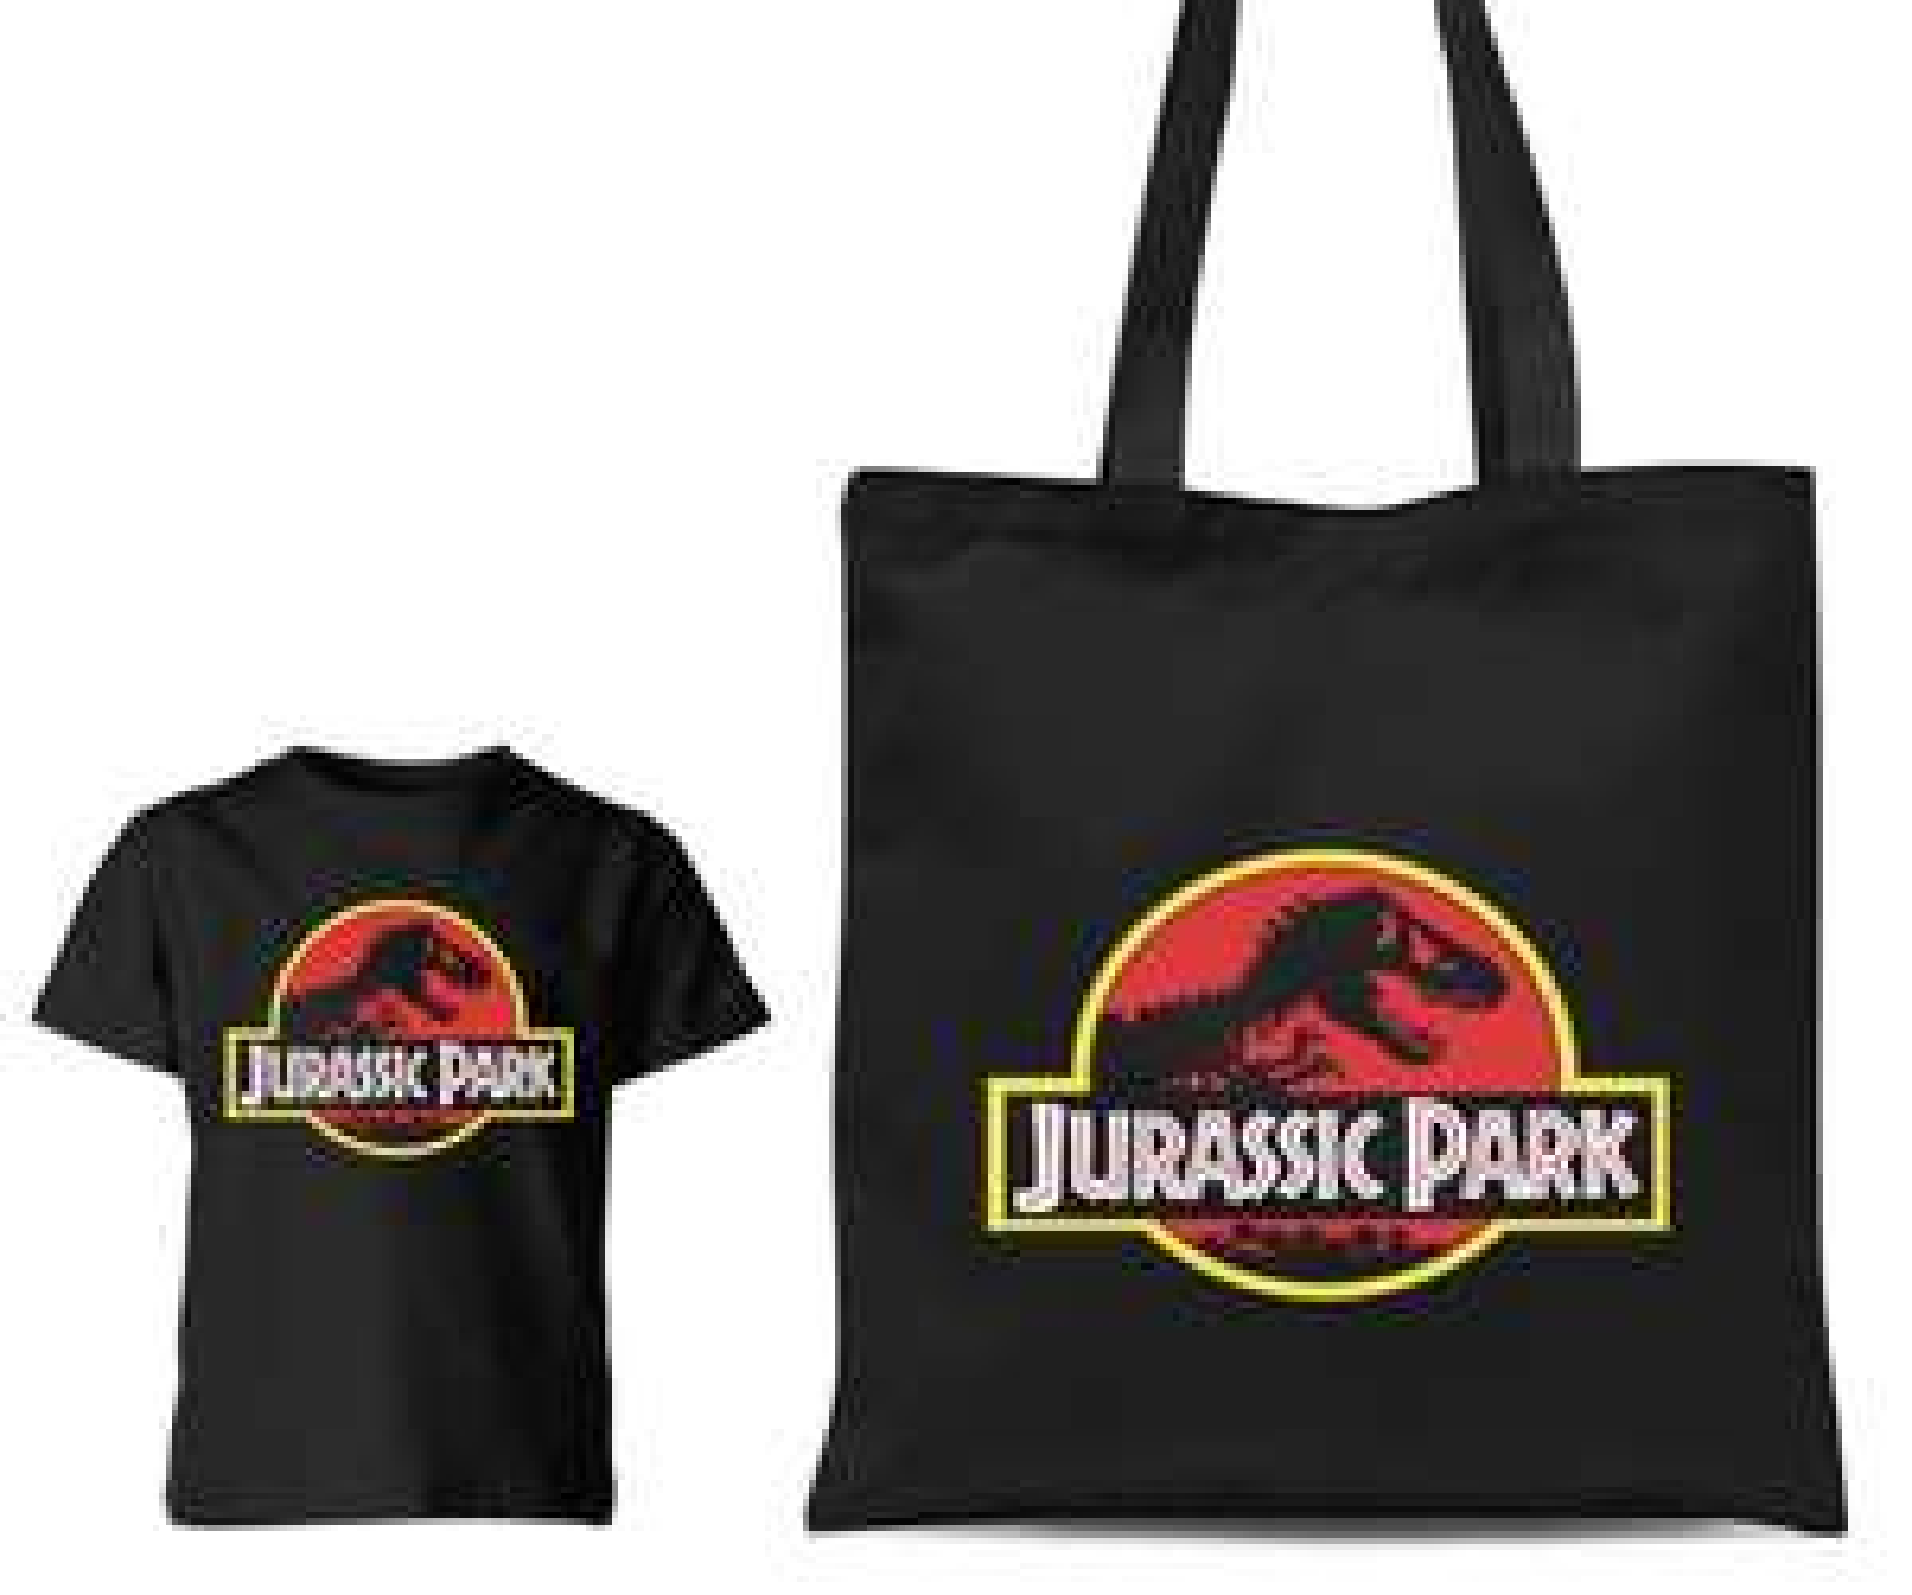 Jurassic Park T-shirt & Tote bag for £8.99 @ Zavvi + £1.99 Shipping